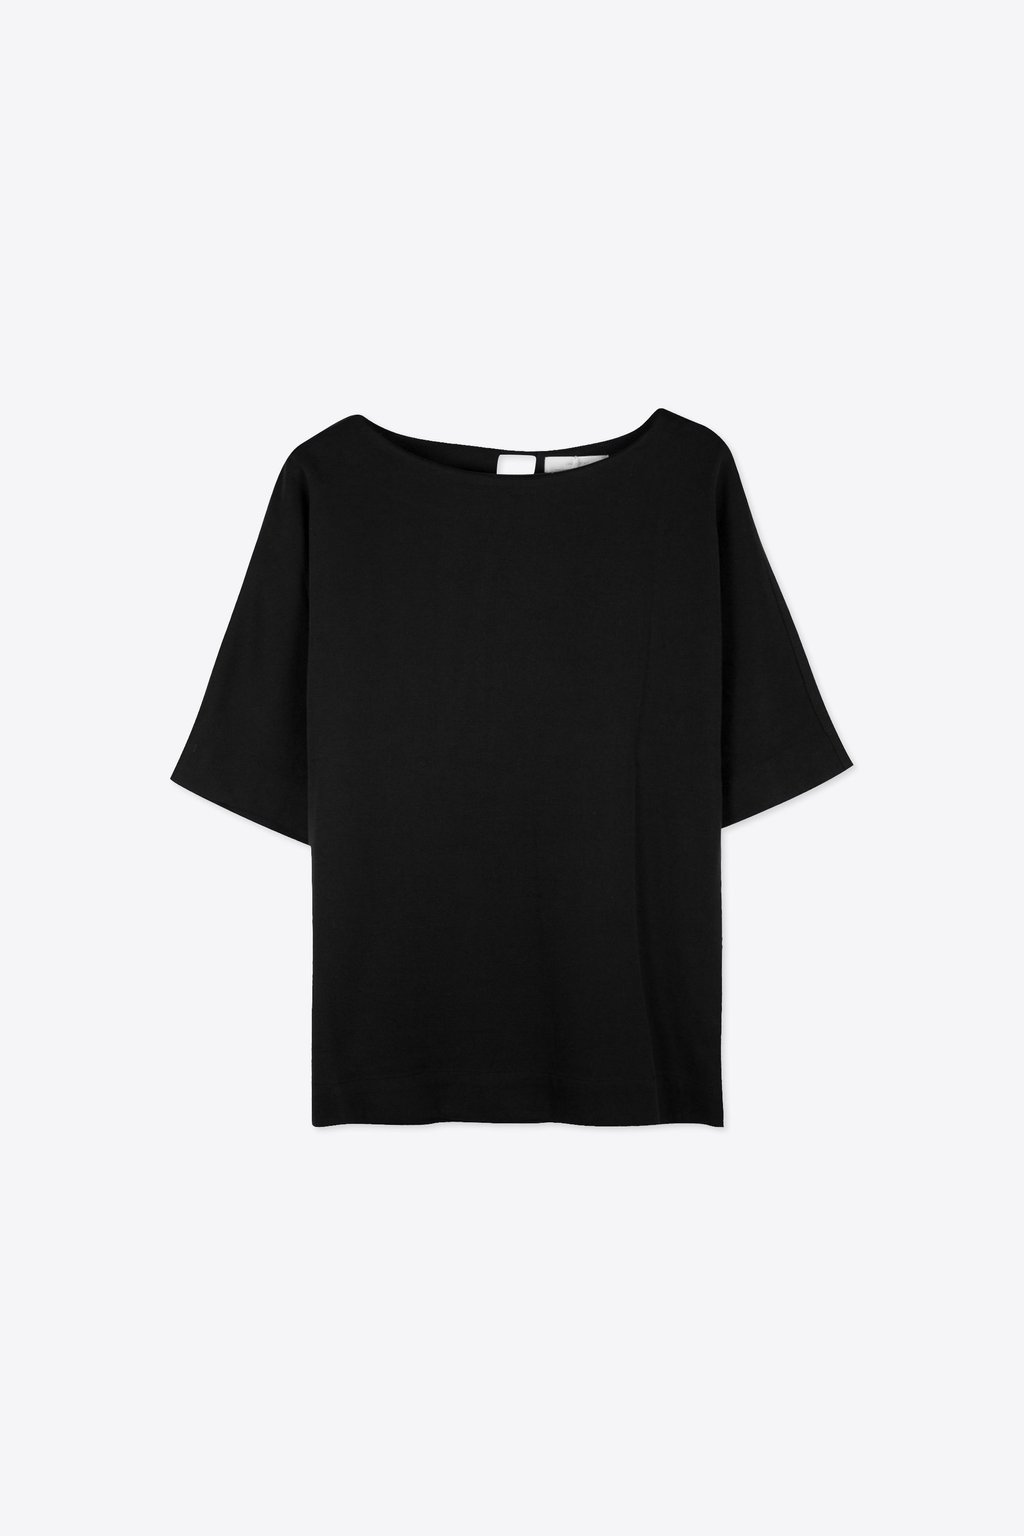 Blouse 1293 Black 7